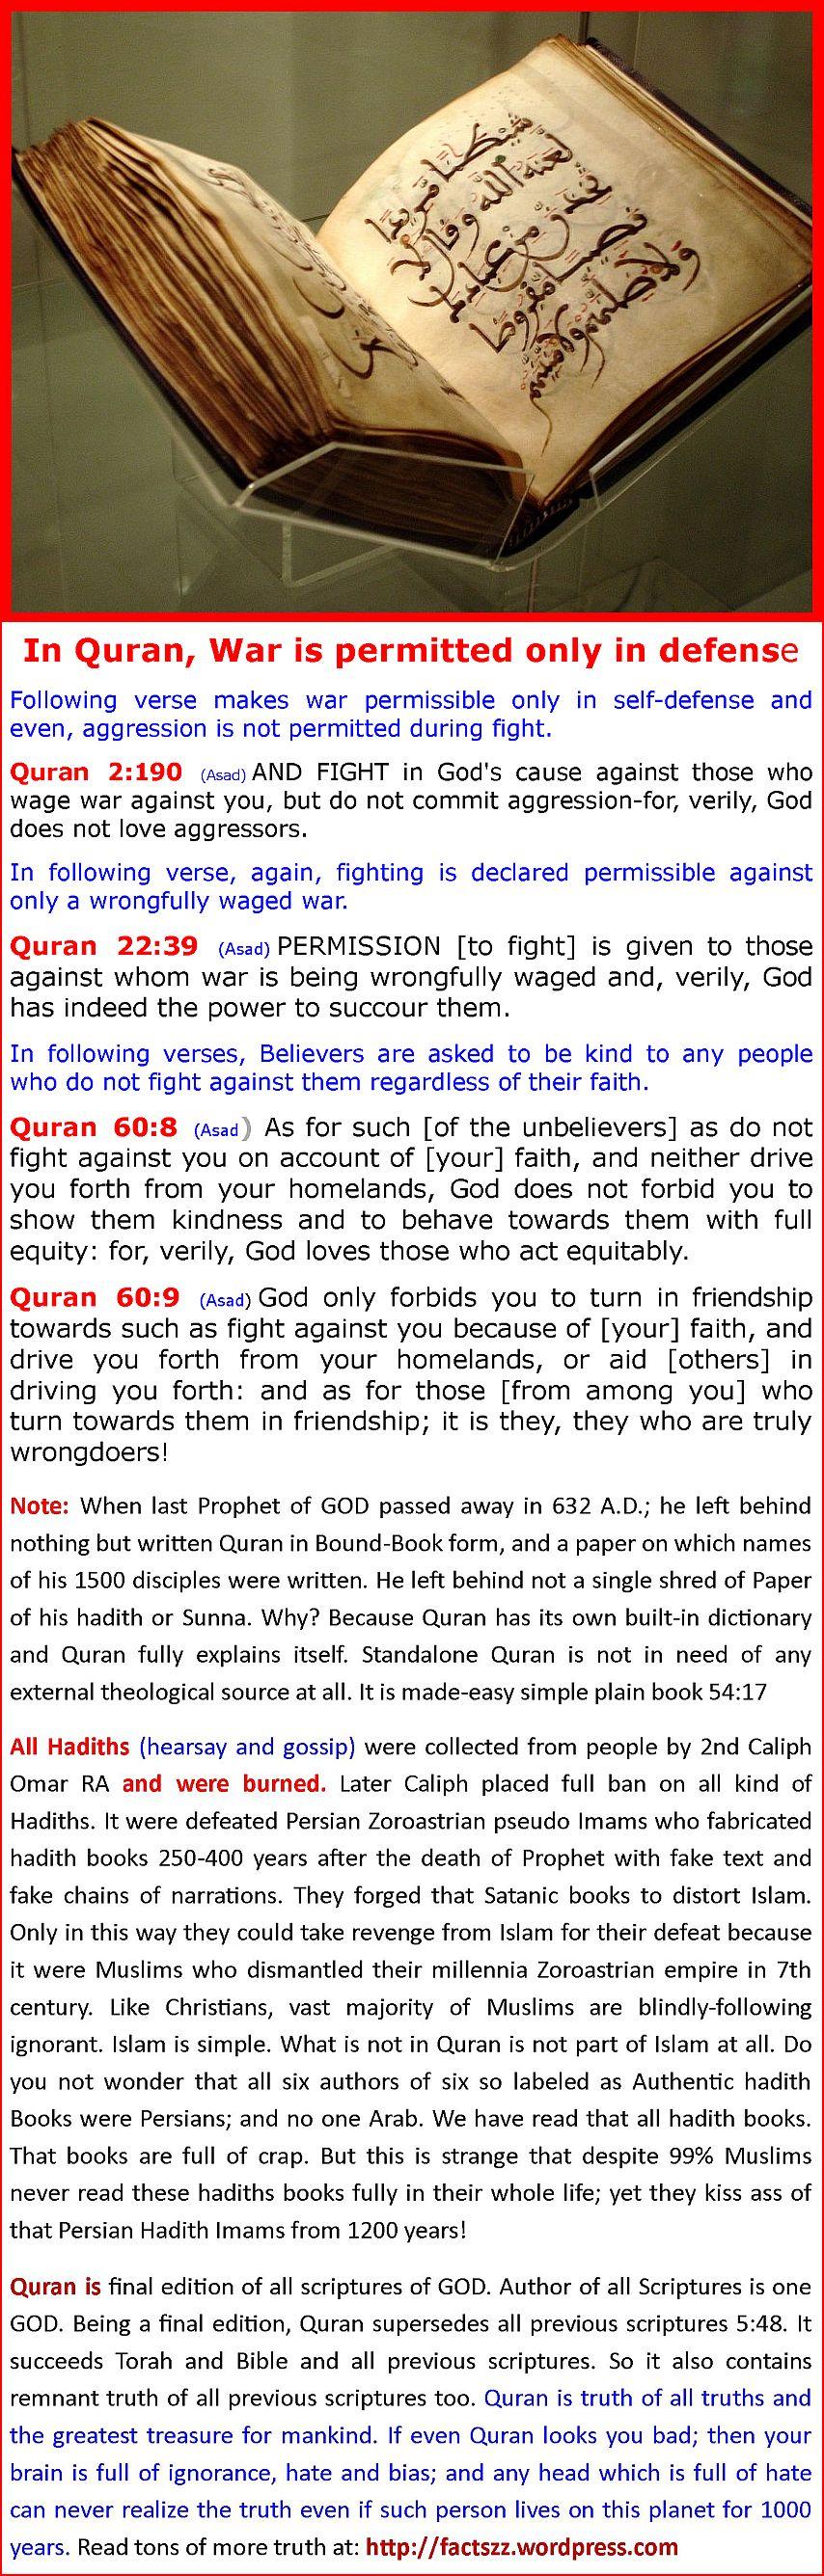 QuranPermitsWarinDefenseOnly